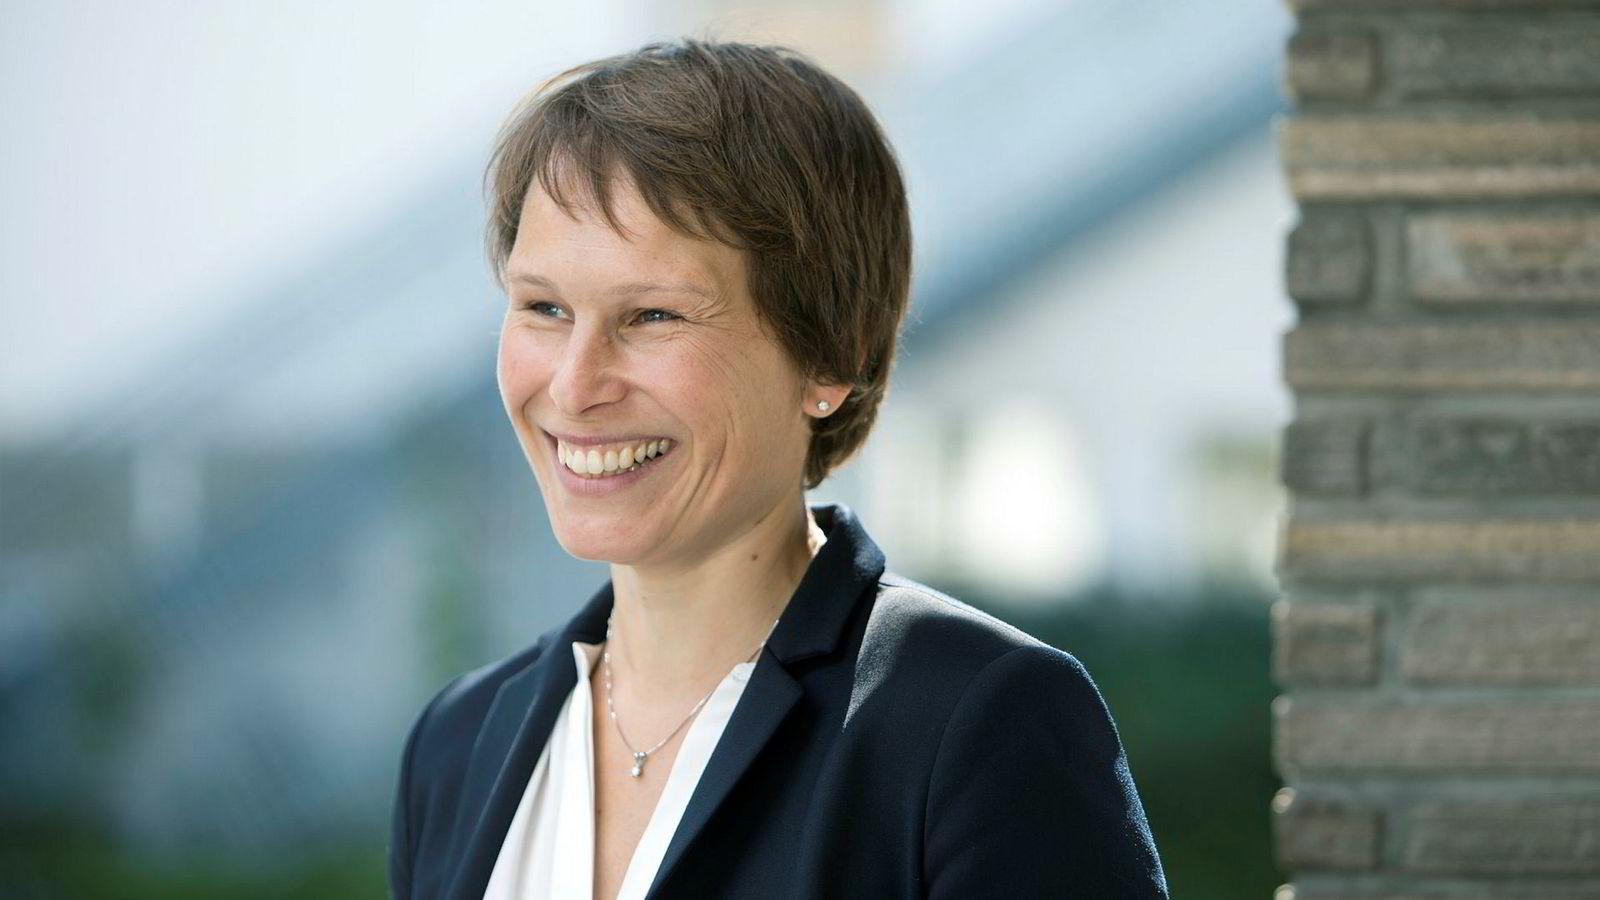 – Det finnes forskning på at økonomiske incentiver har positiv effekt på fullføring, sier Linda Nøstbakken, prorektor for utdanning på NHH.